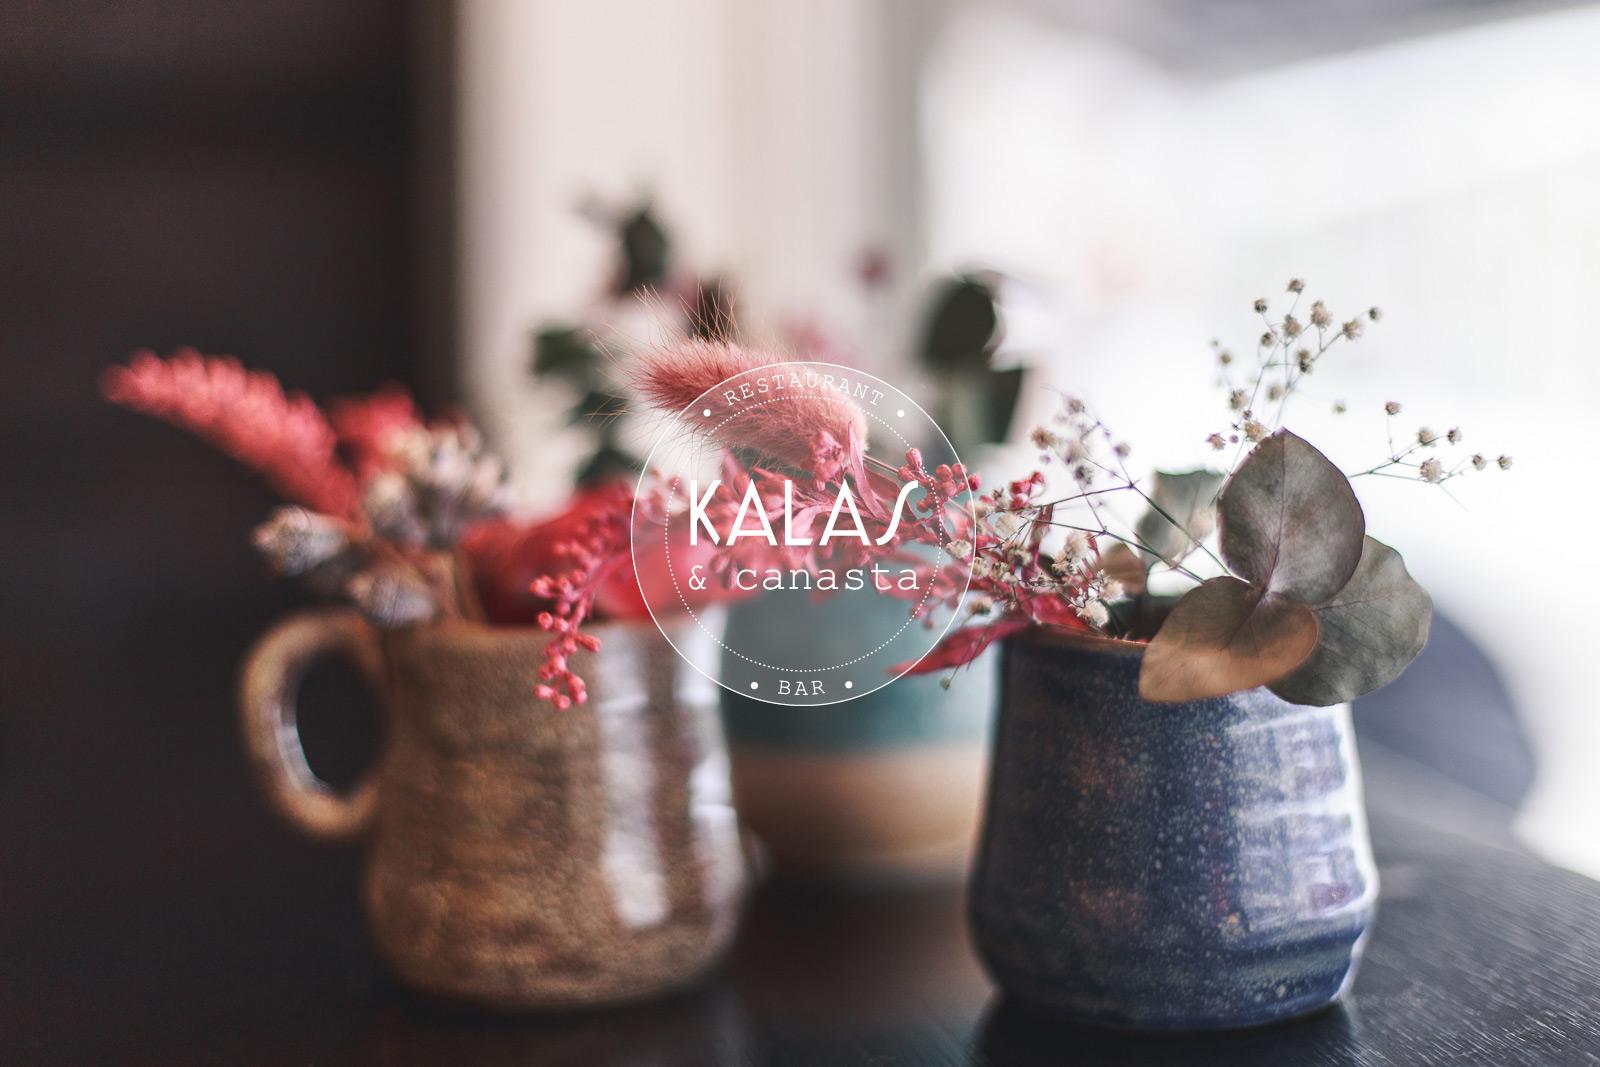 Client: Kalas & Canasta